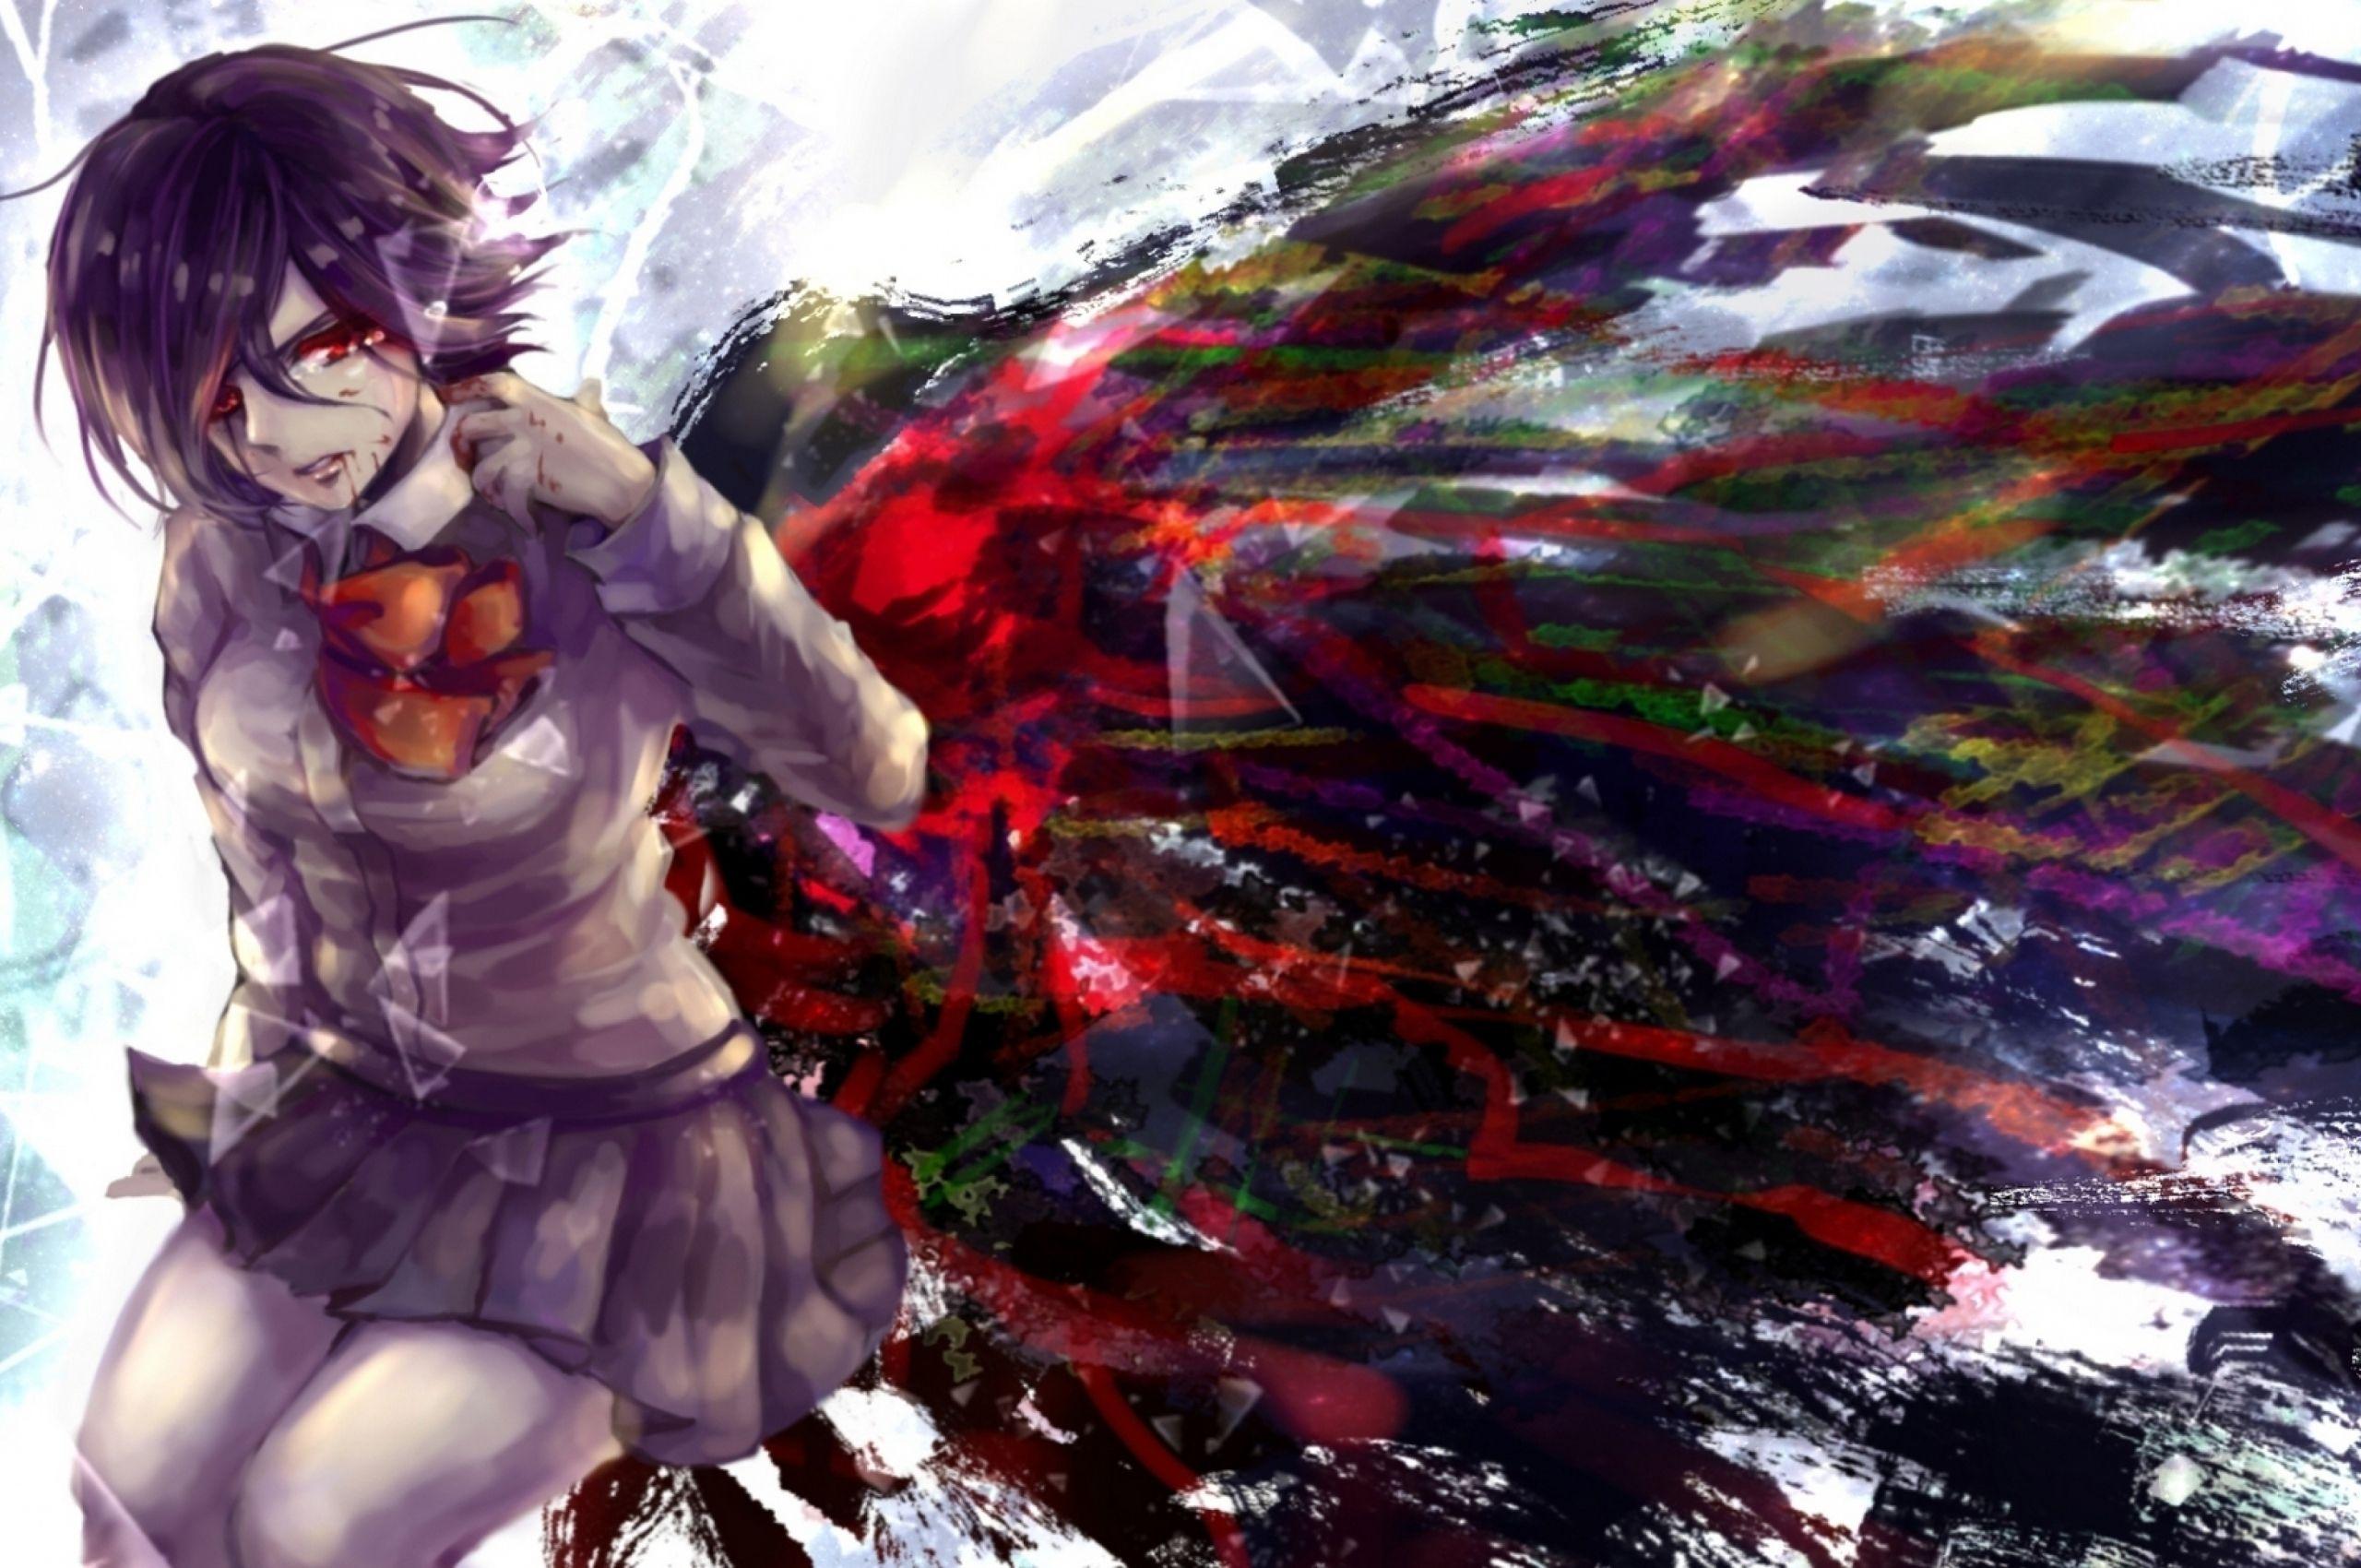 Desktop 4k Anime Tokyo Ghoul Wallpapers - Wallpaper Cave